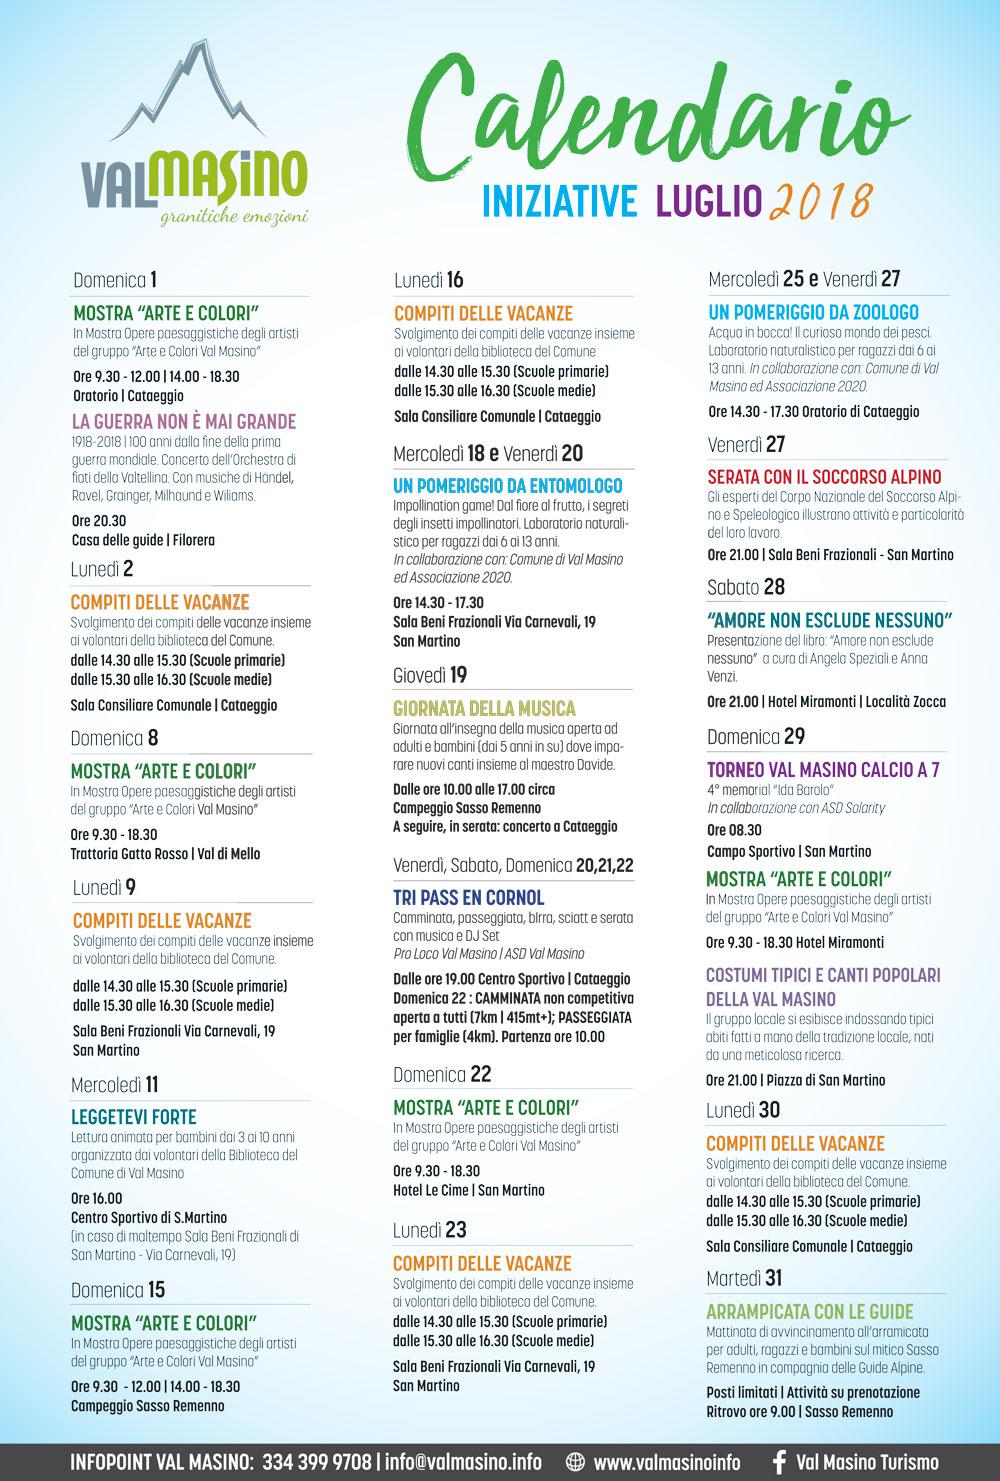 Calendario Mondiali 2020 Pdf.Calendario Iniziative Luglio 2018 Val Masino